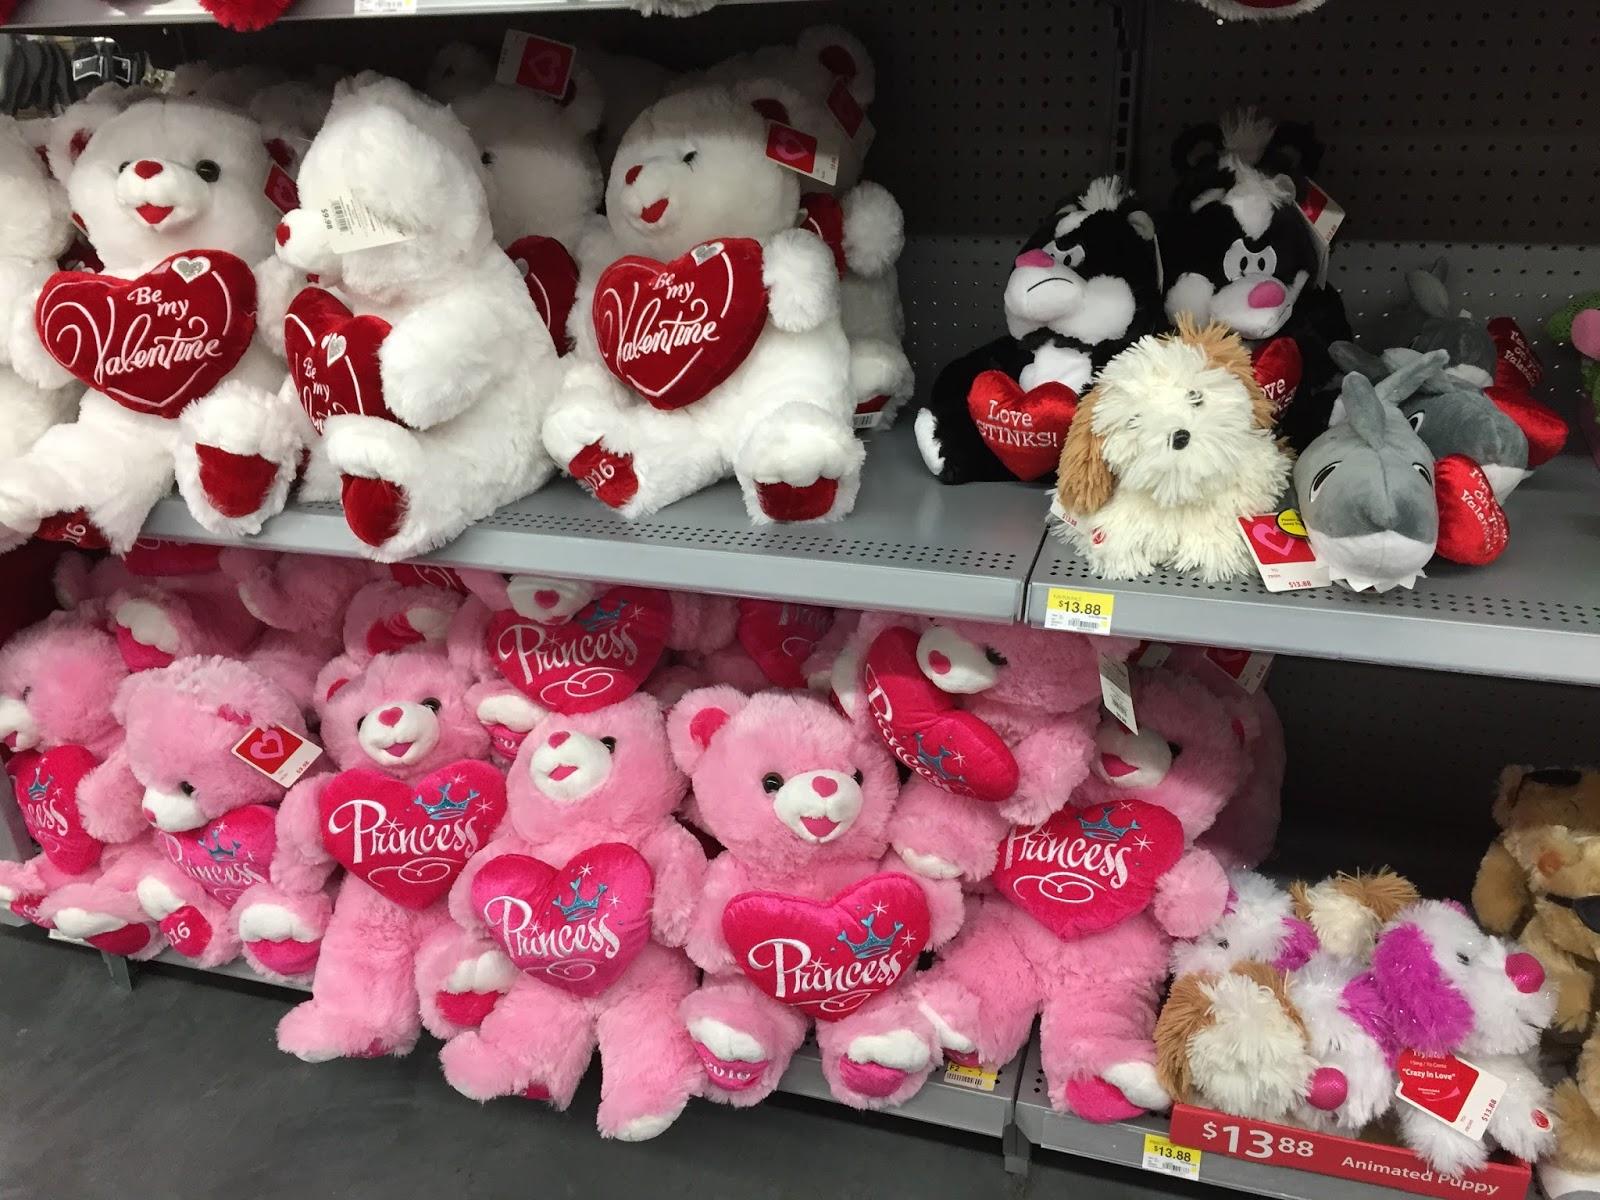 Big Teddy Bear Valentines Day Walmart Rytir